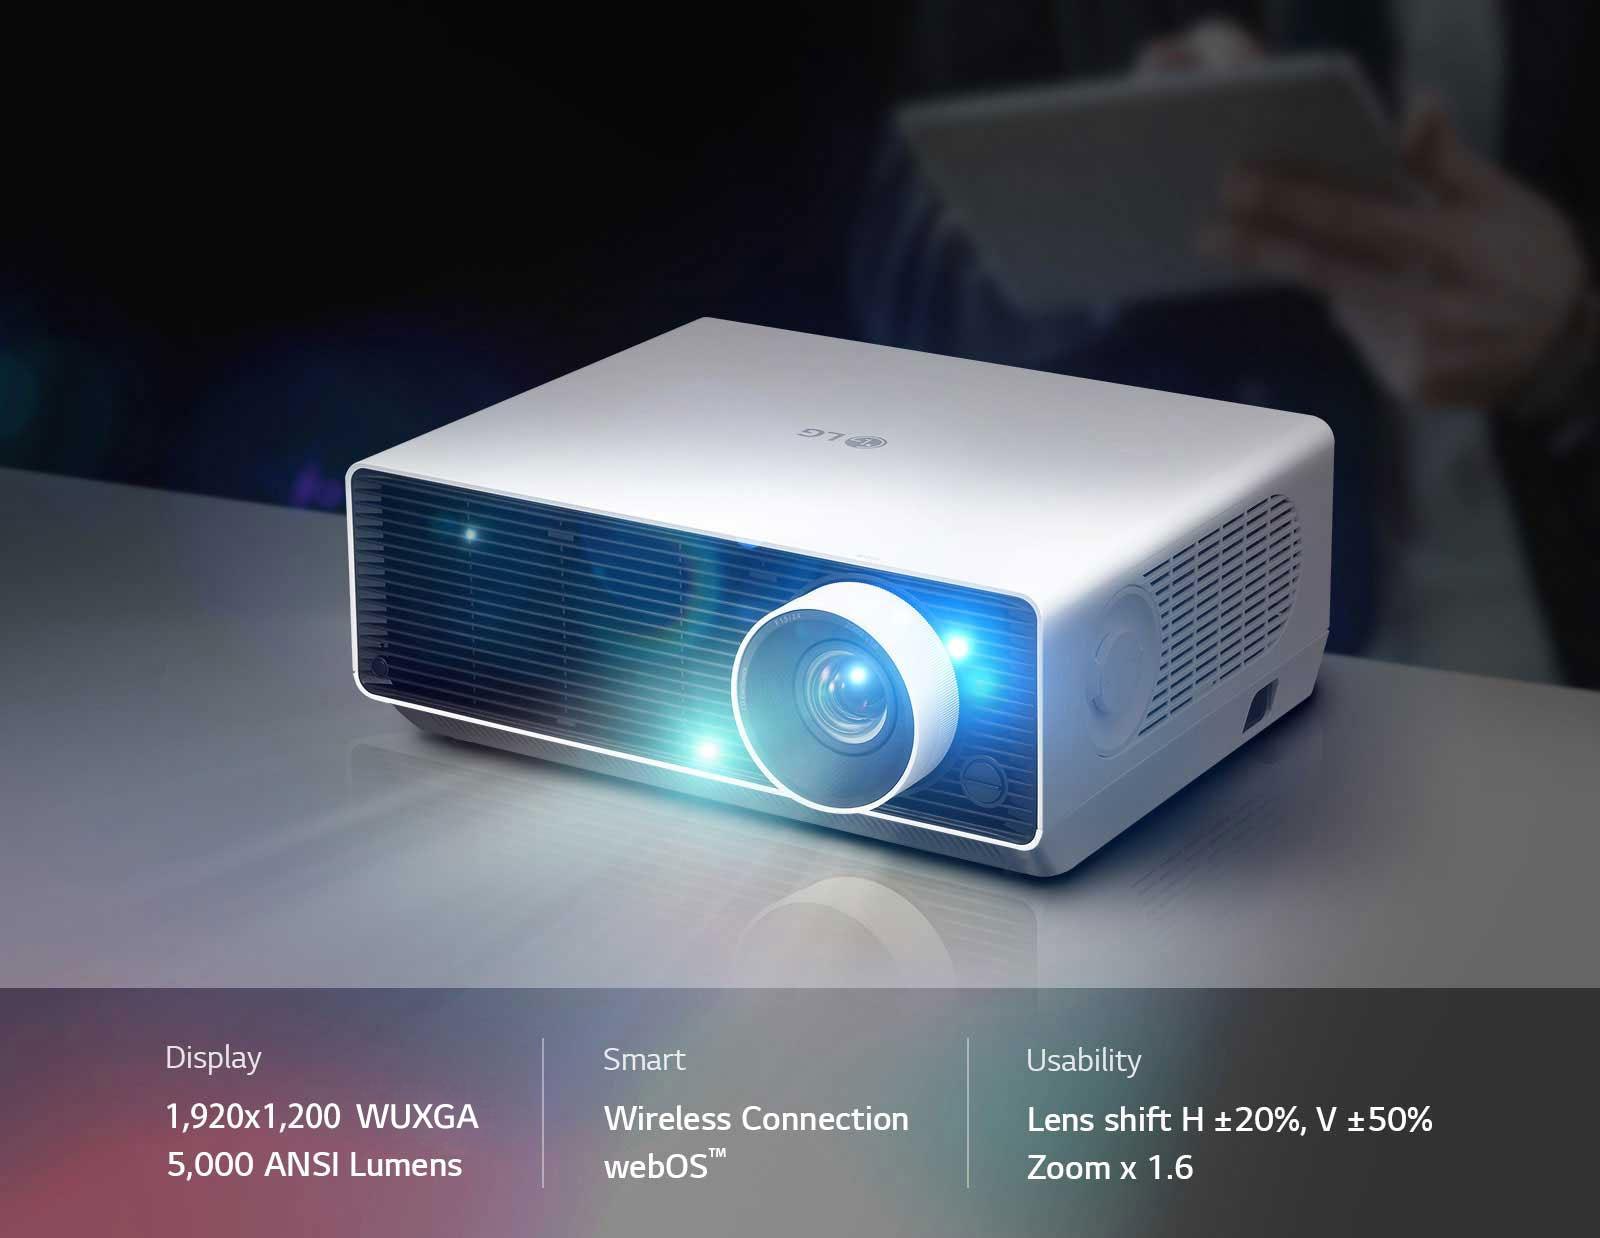 LG ProBeam 4K Laser Projector for Business